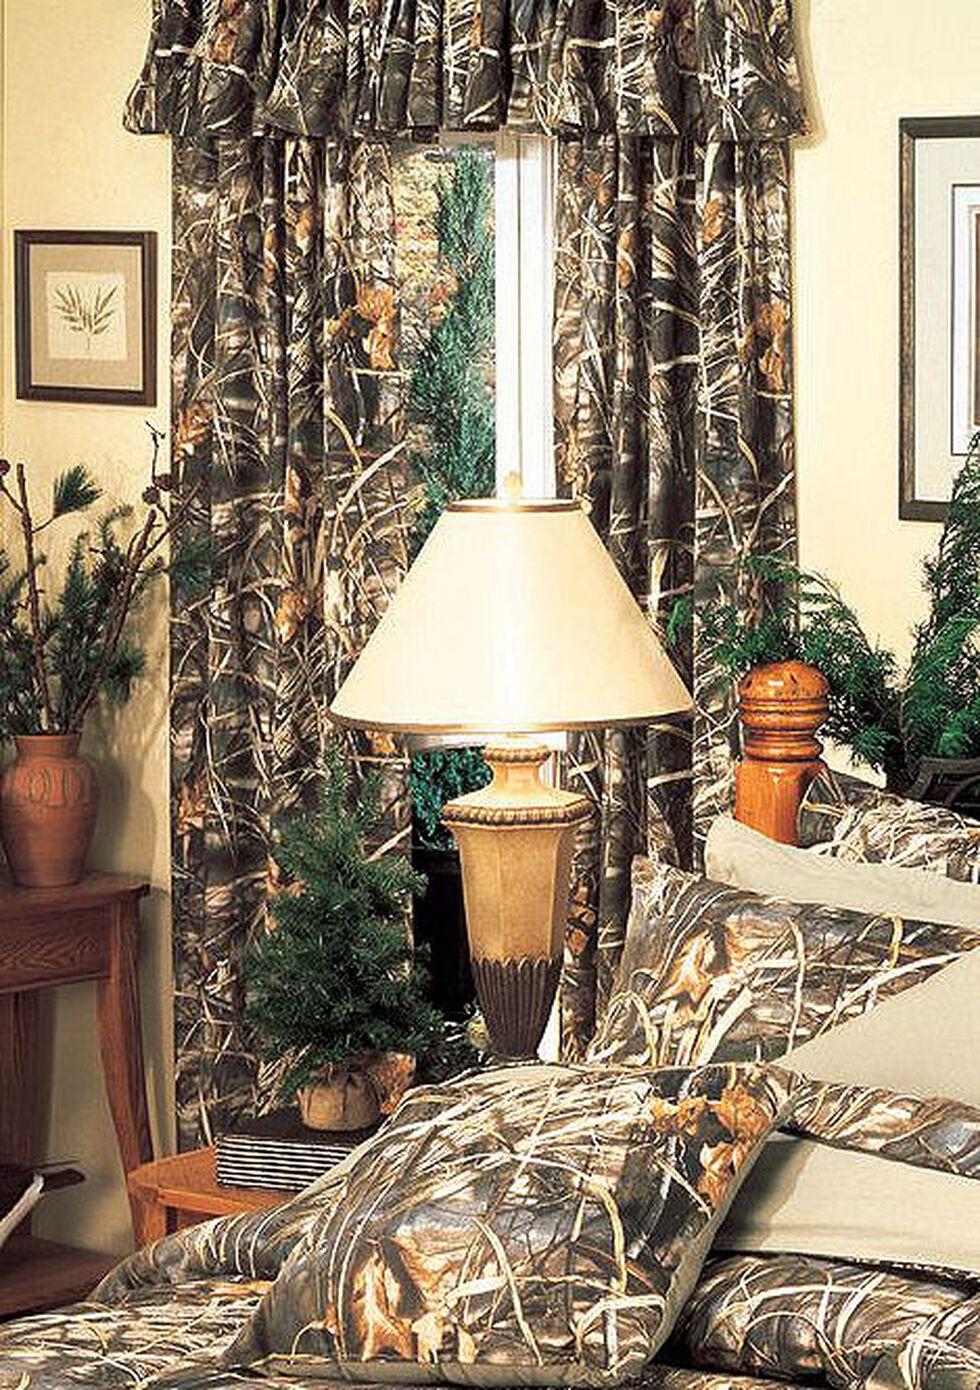 Realtree MAX-4 Camo Drapes, Camouflage, hi-res